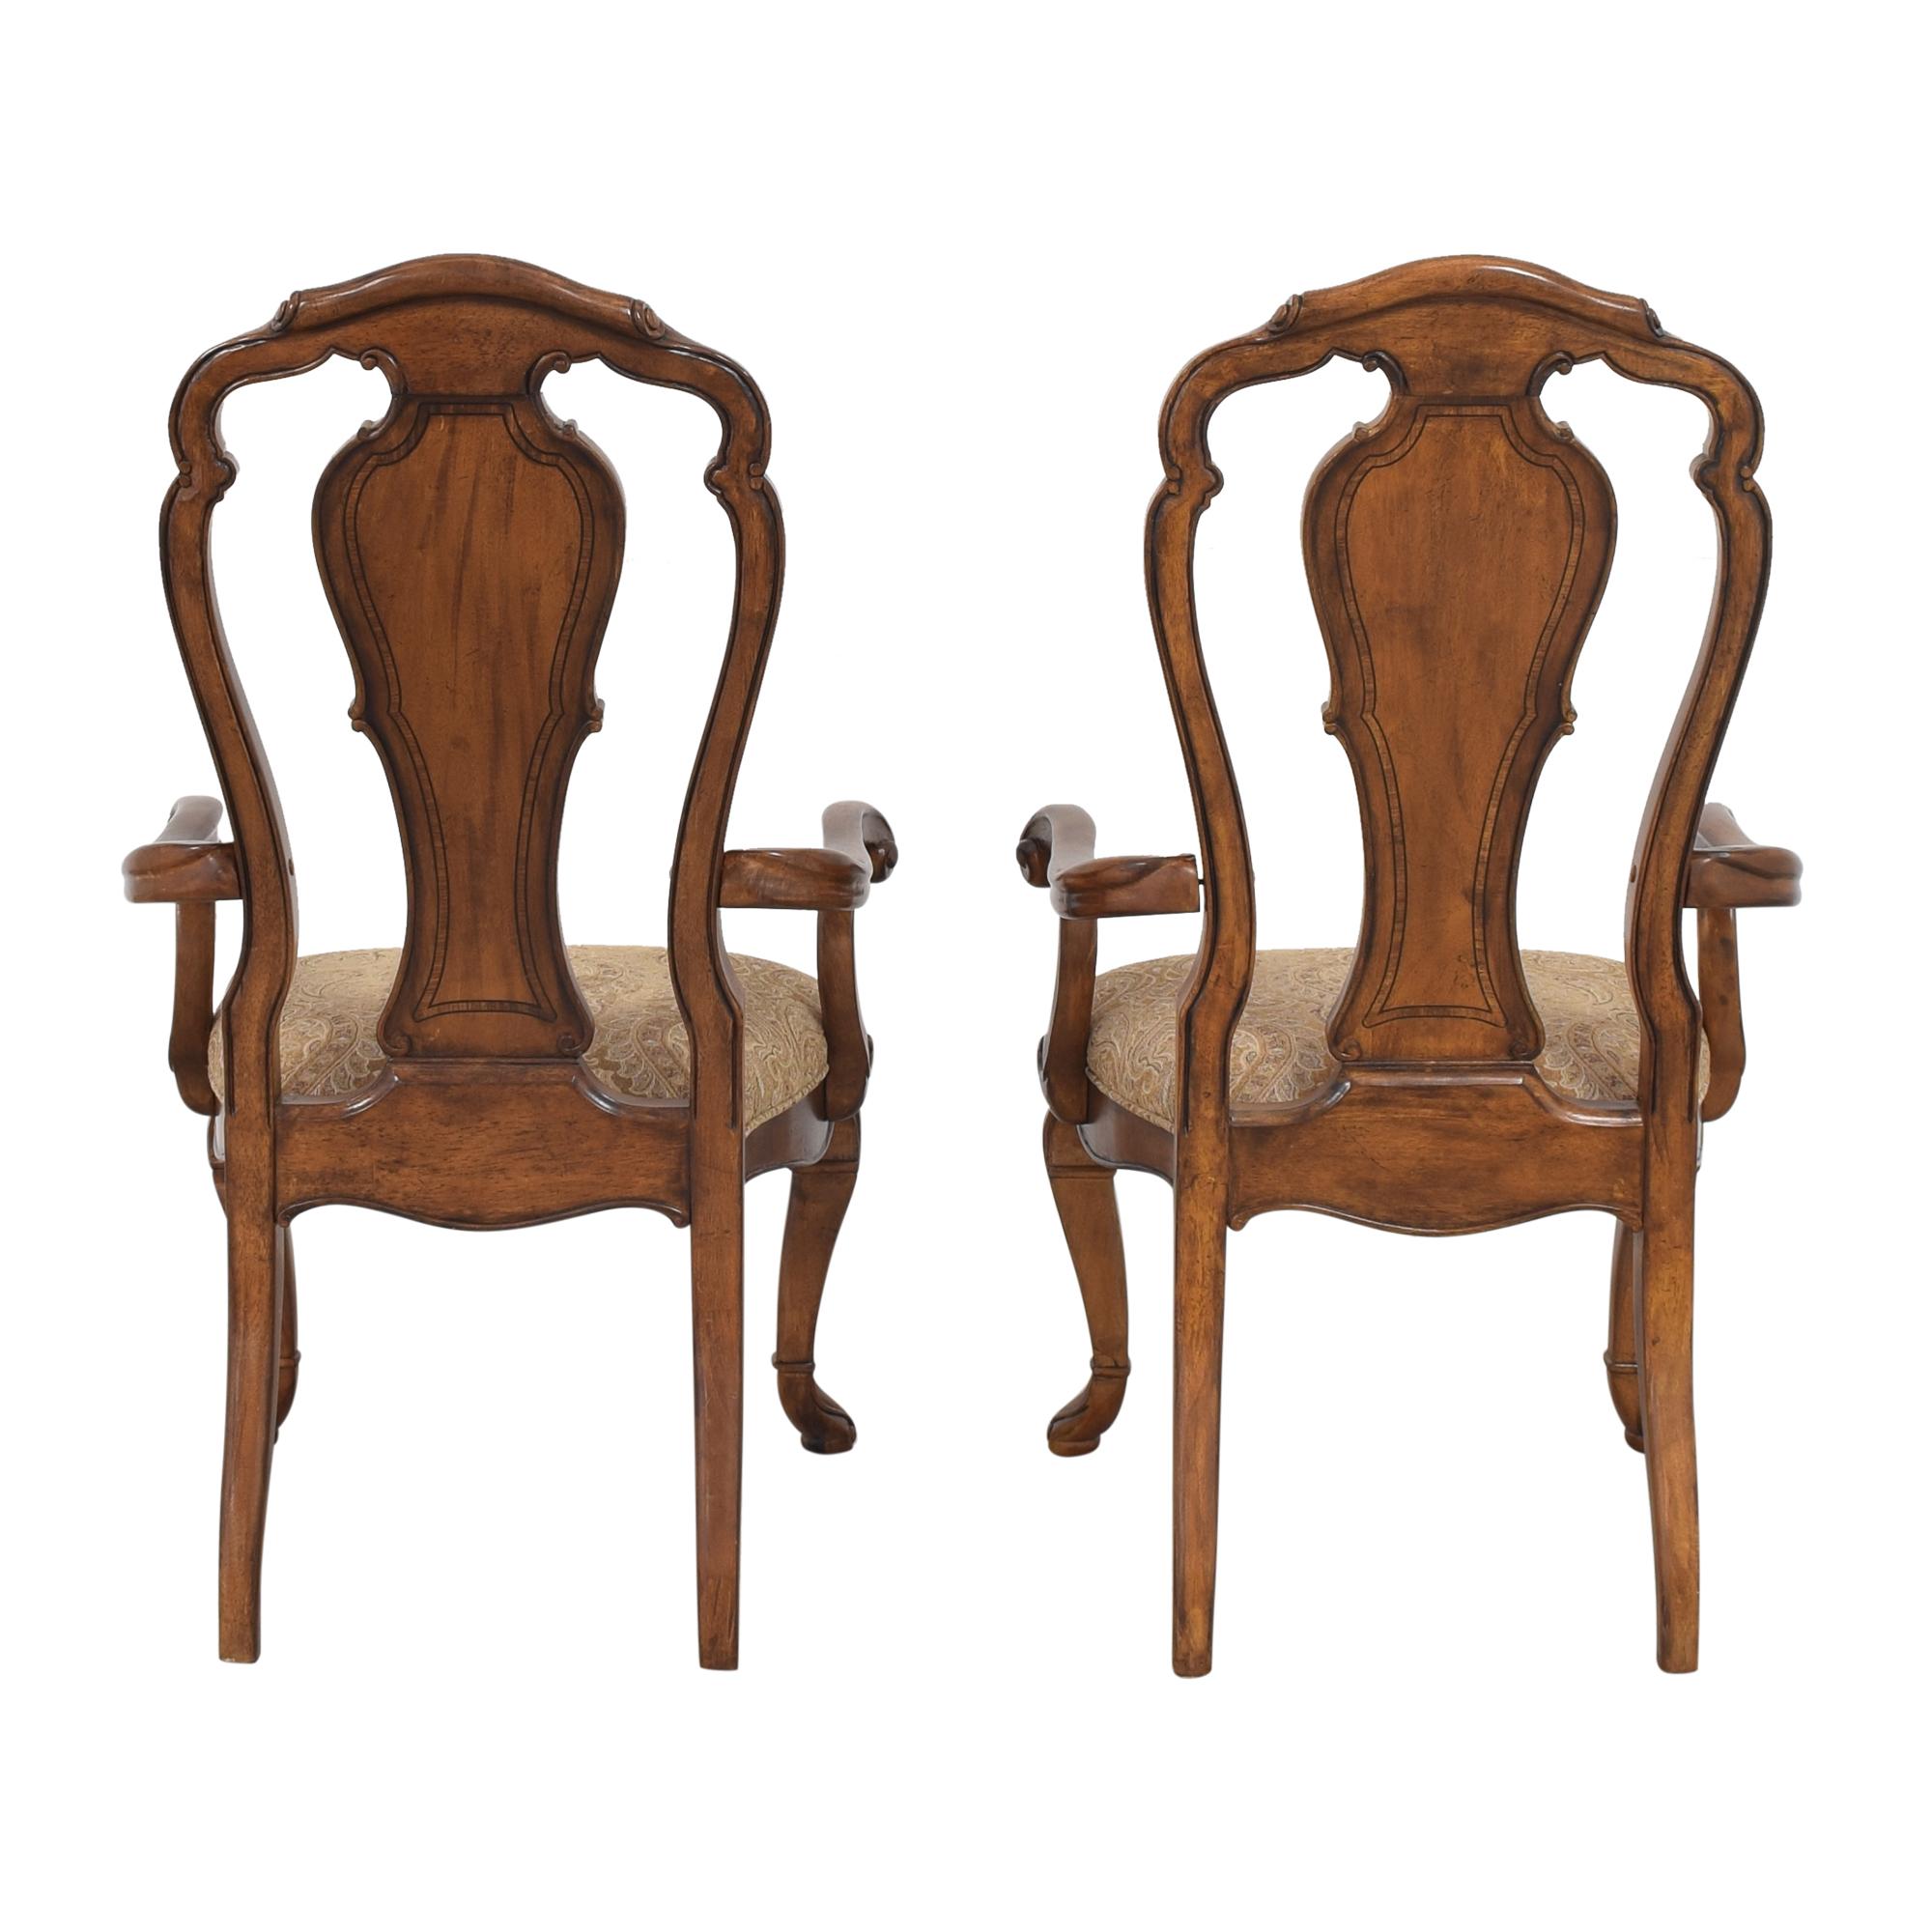 buy Thomasville Ernest Hemingway Granada Dining Arm Chairs Thomasville Chairs